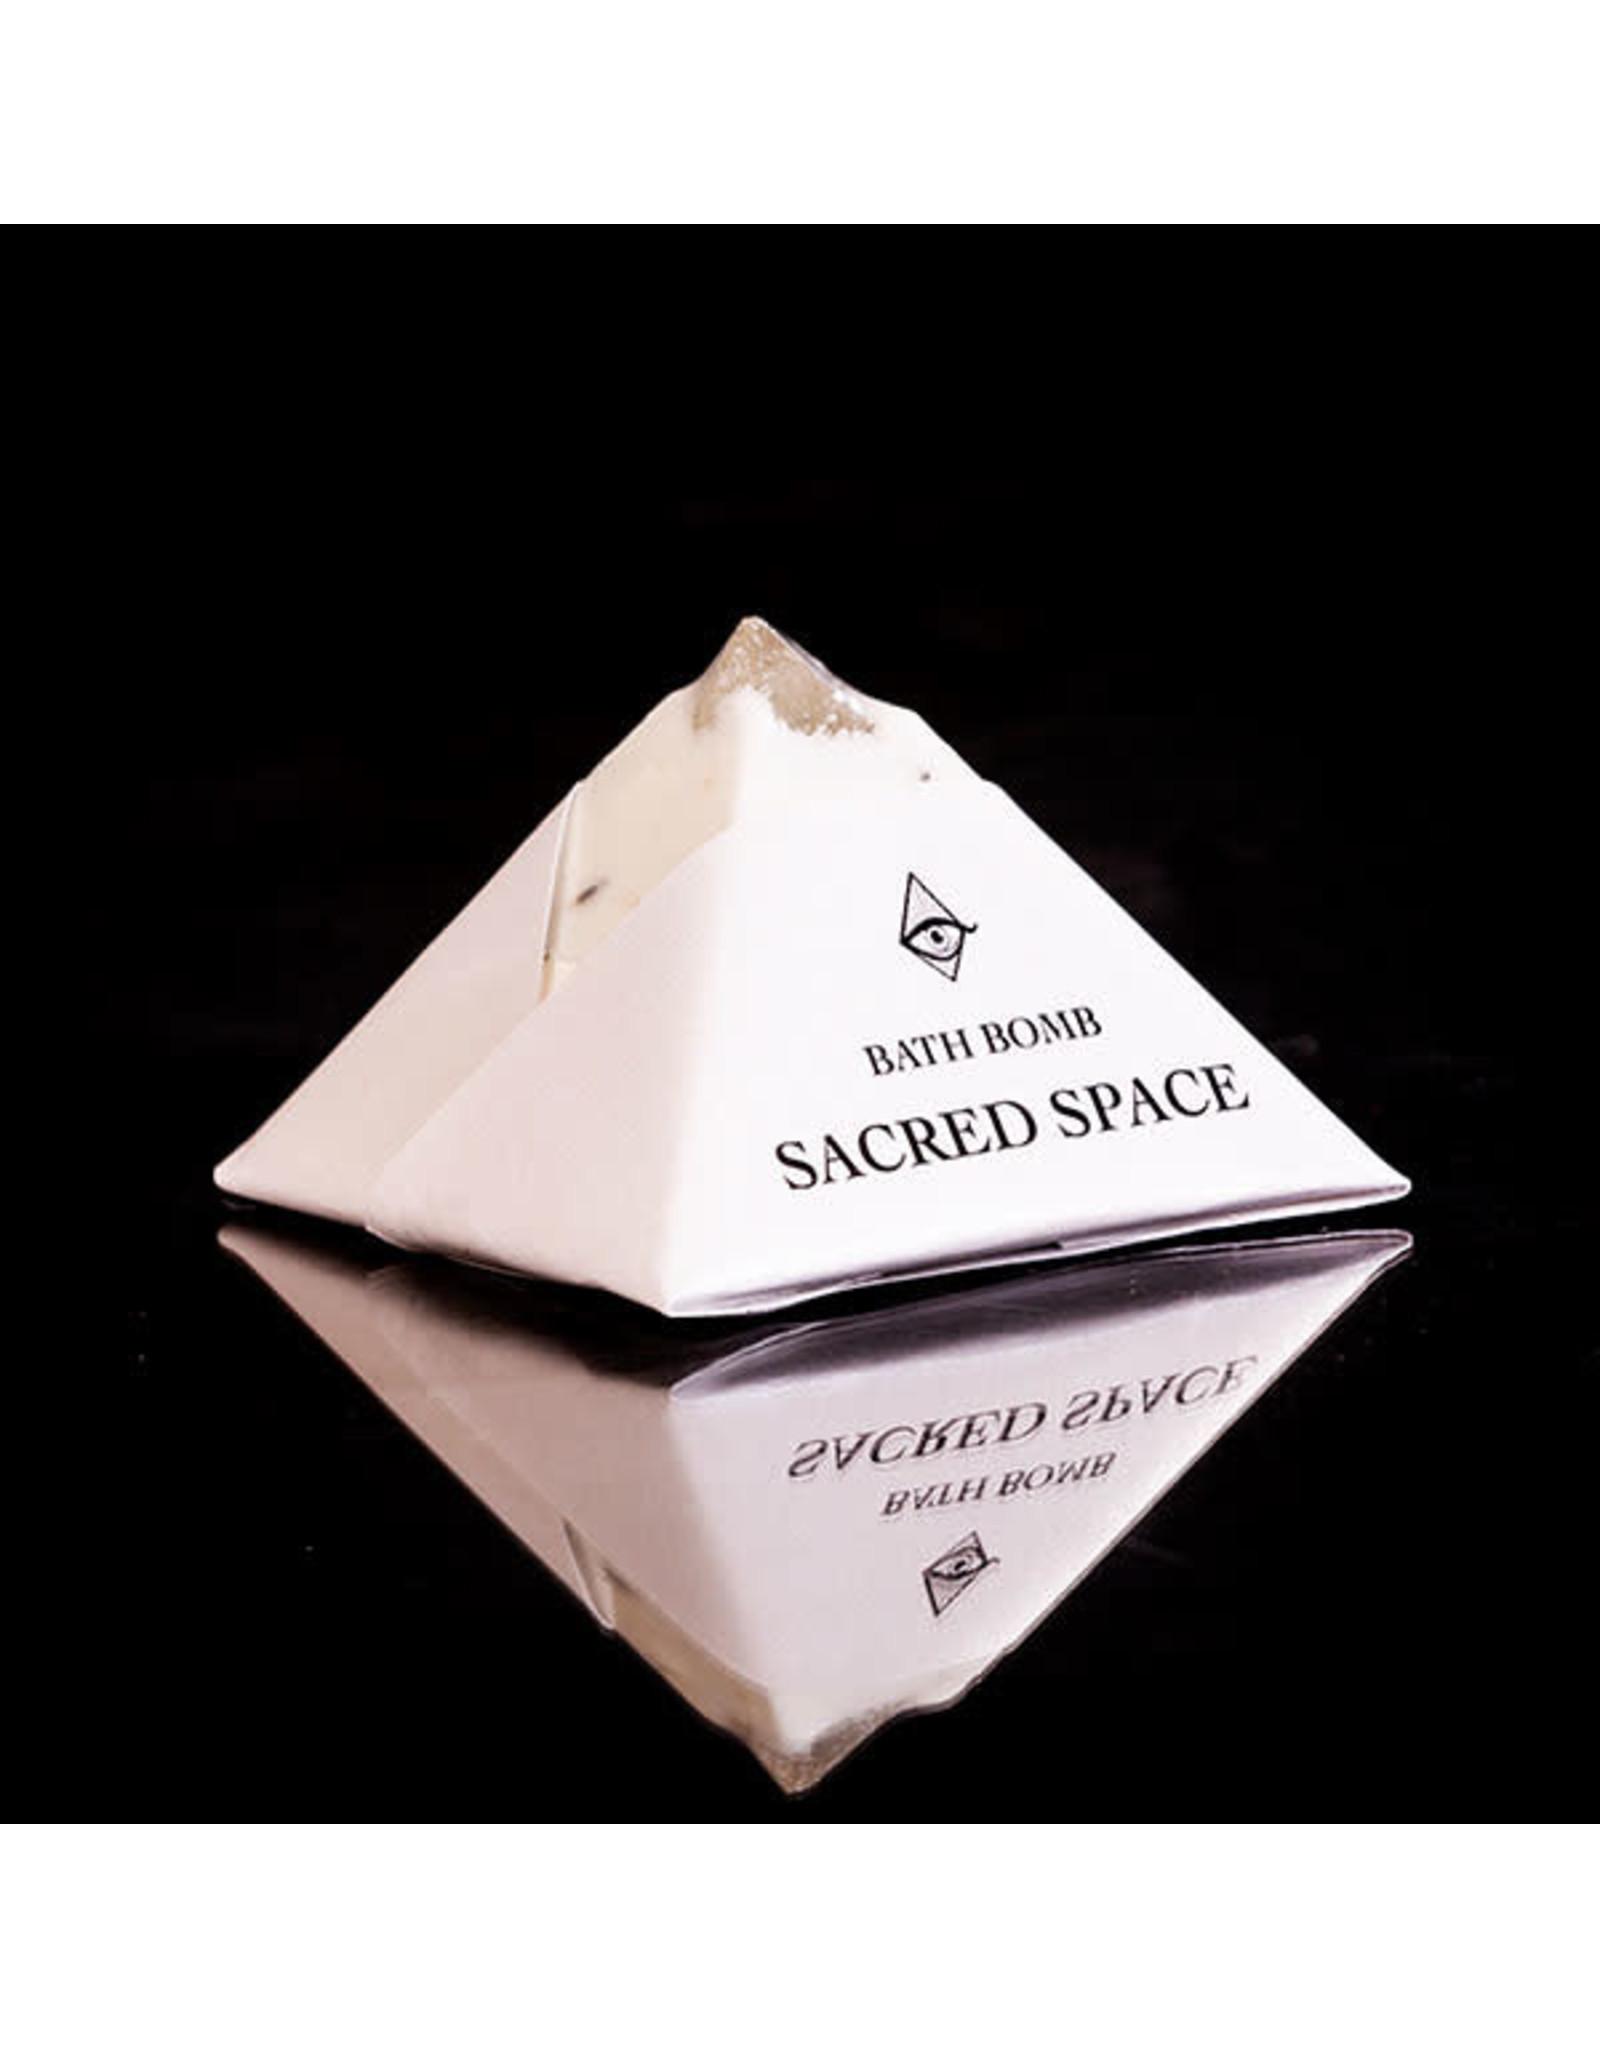 Sacred Space - Bath Bomb